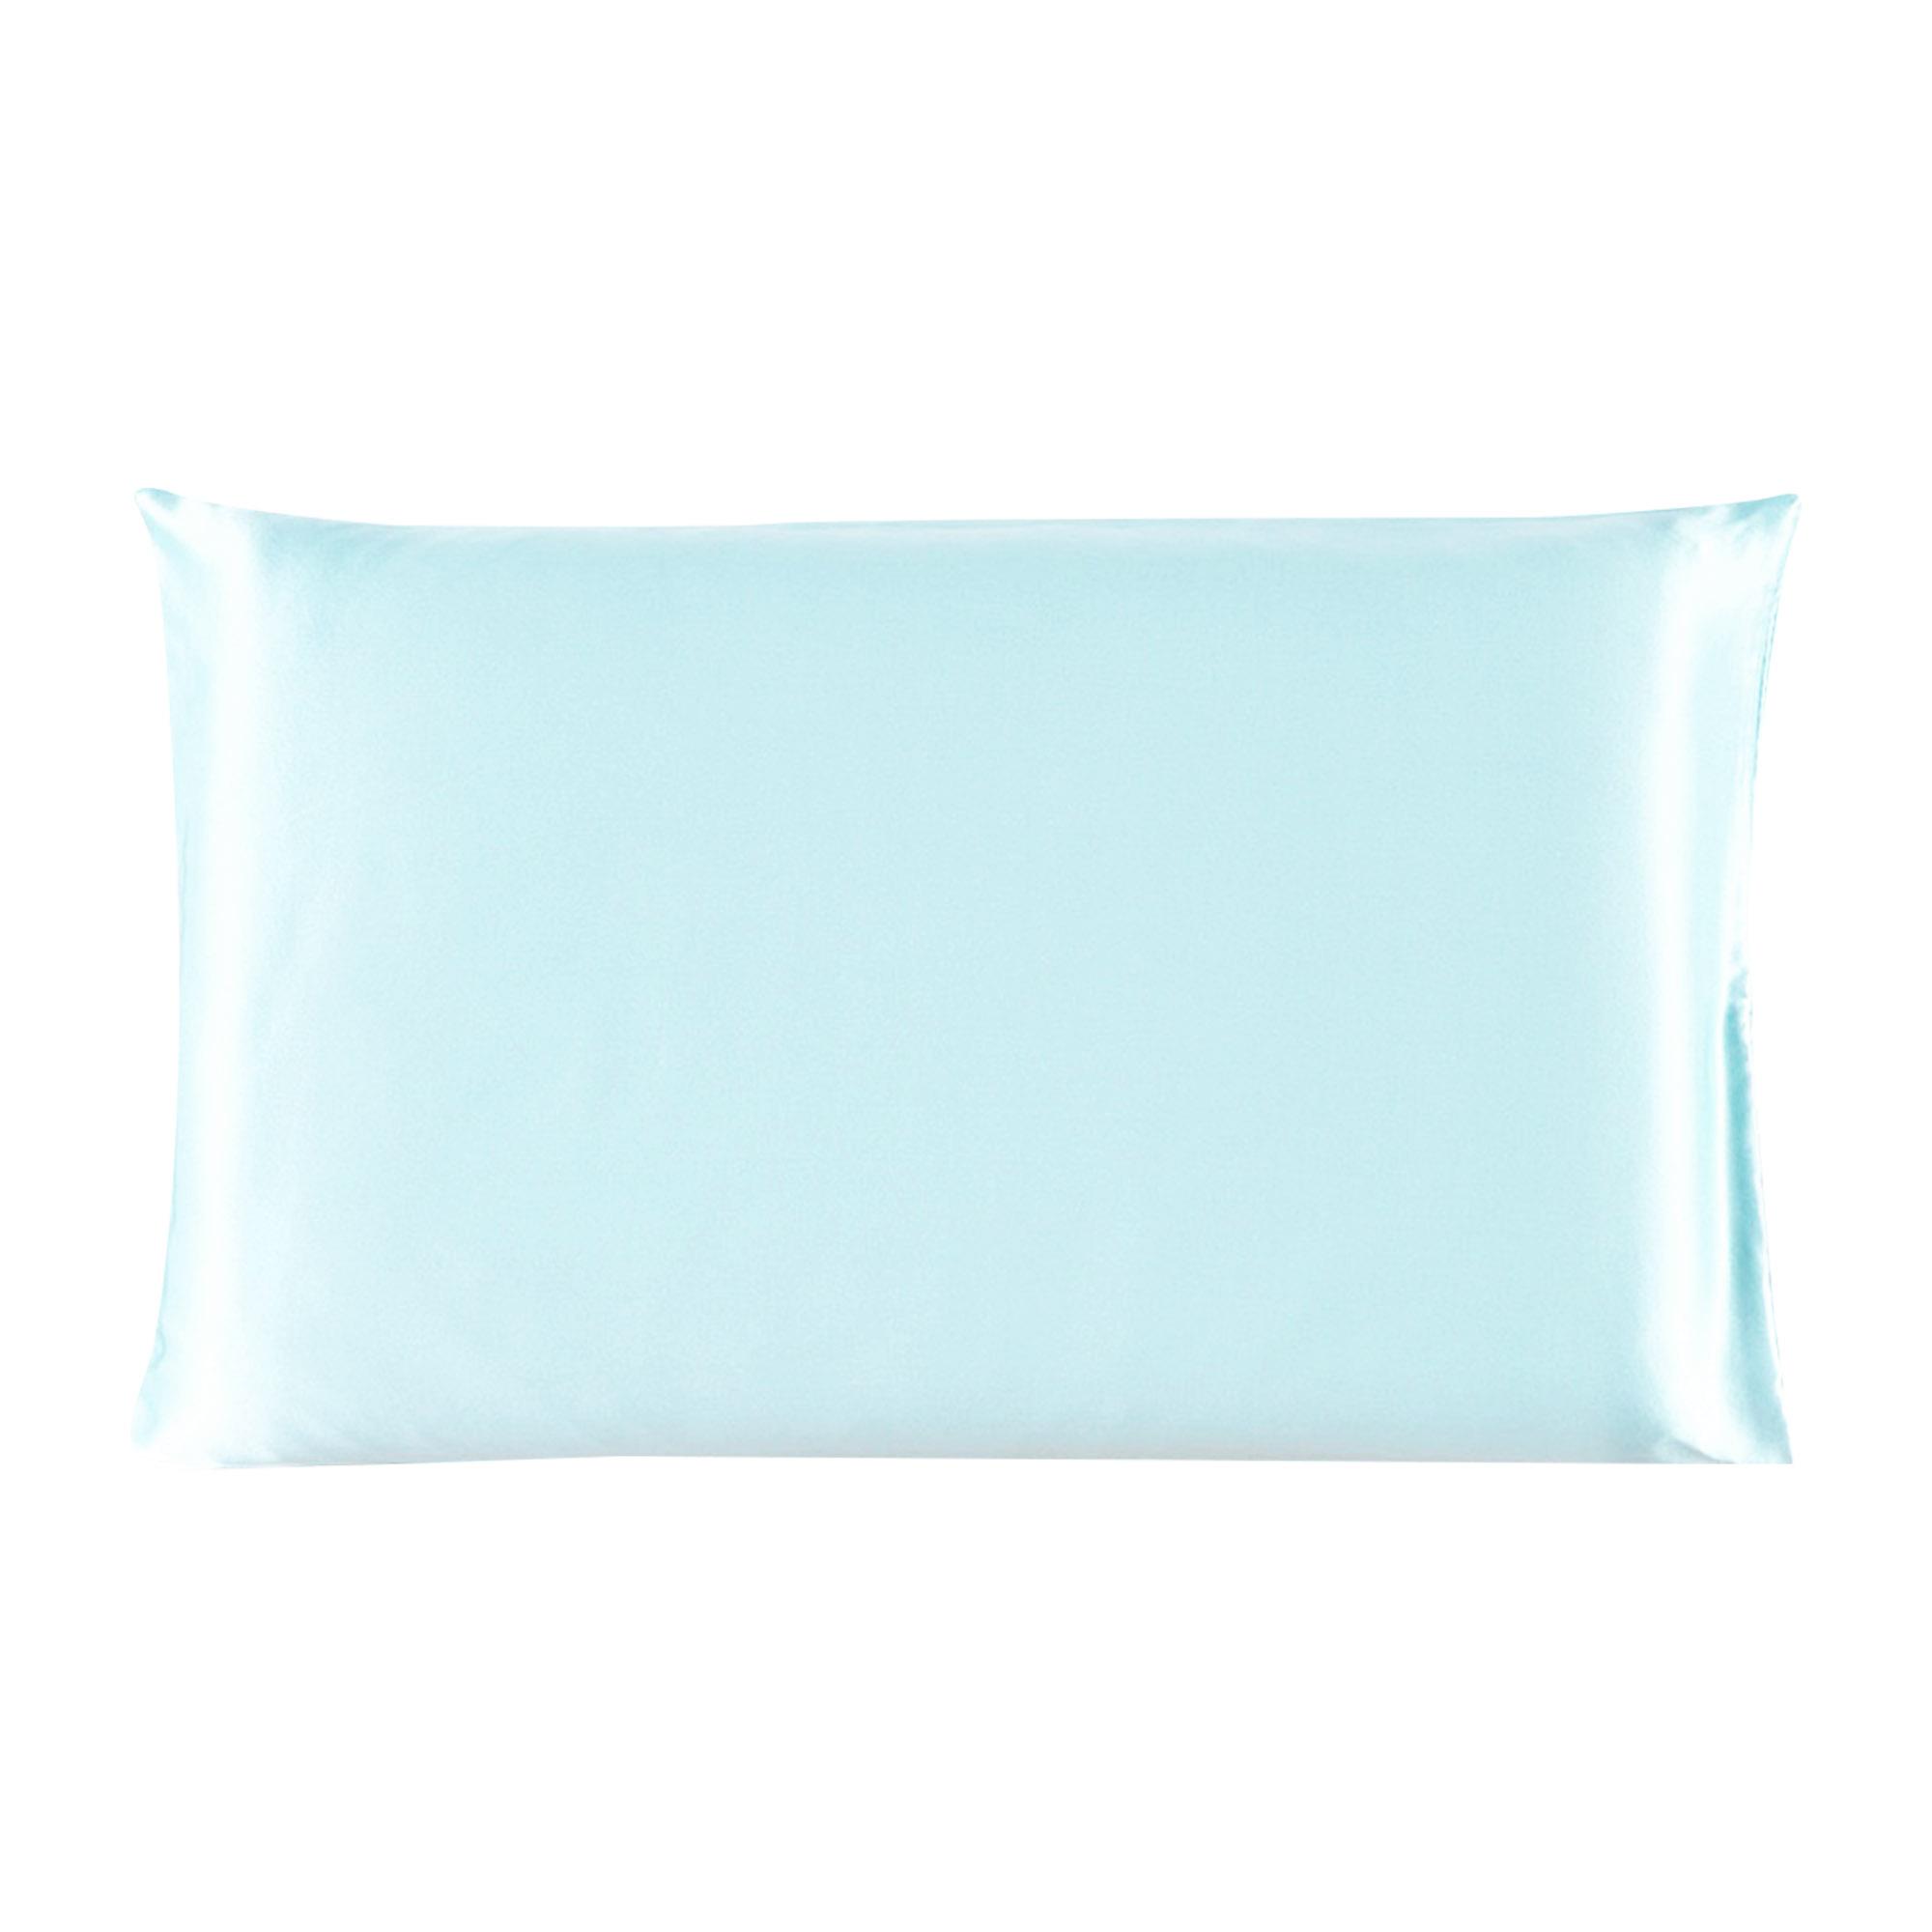 Piccocasa 100% Mulberry Silk Pillow Case Cover Pillowcase Light Blue Queen Size